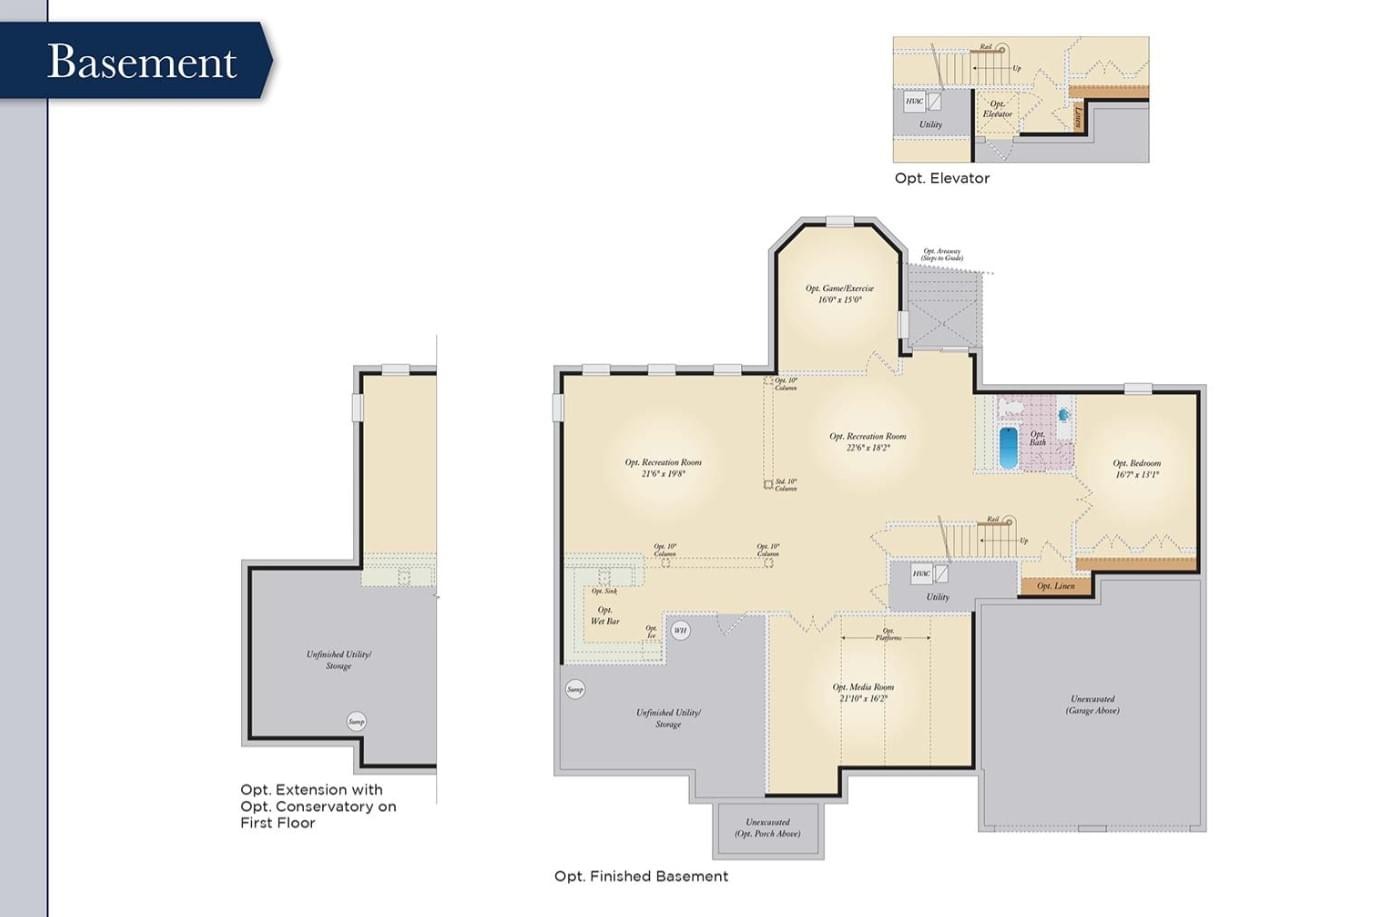 Basement. 5,360sf New Home